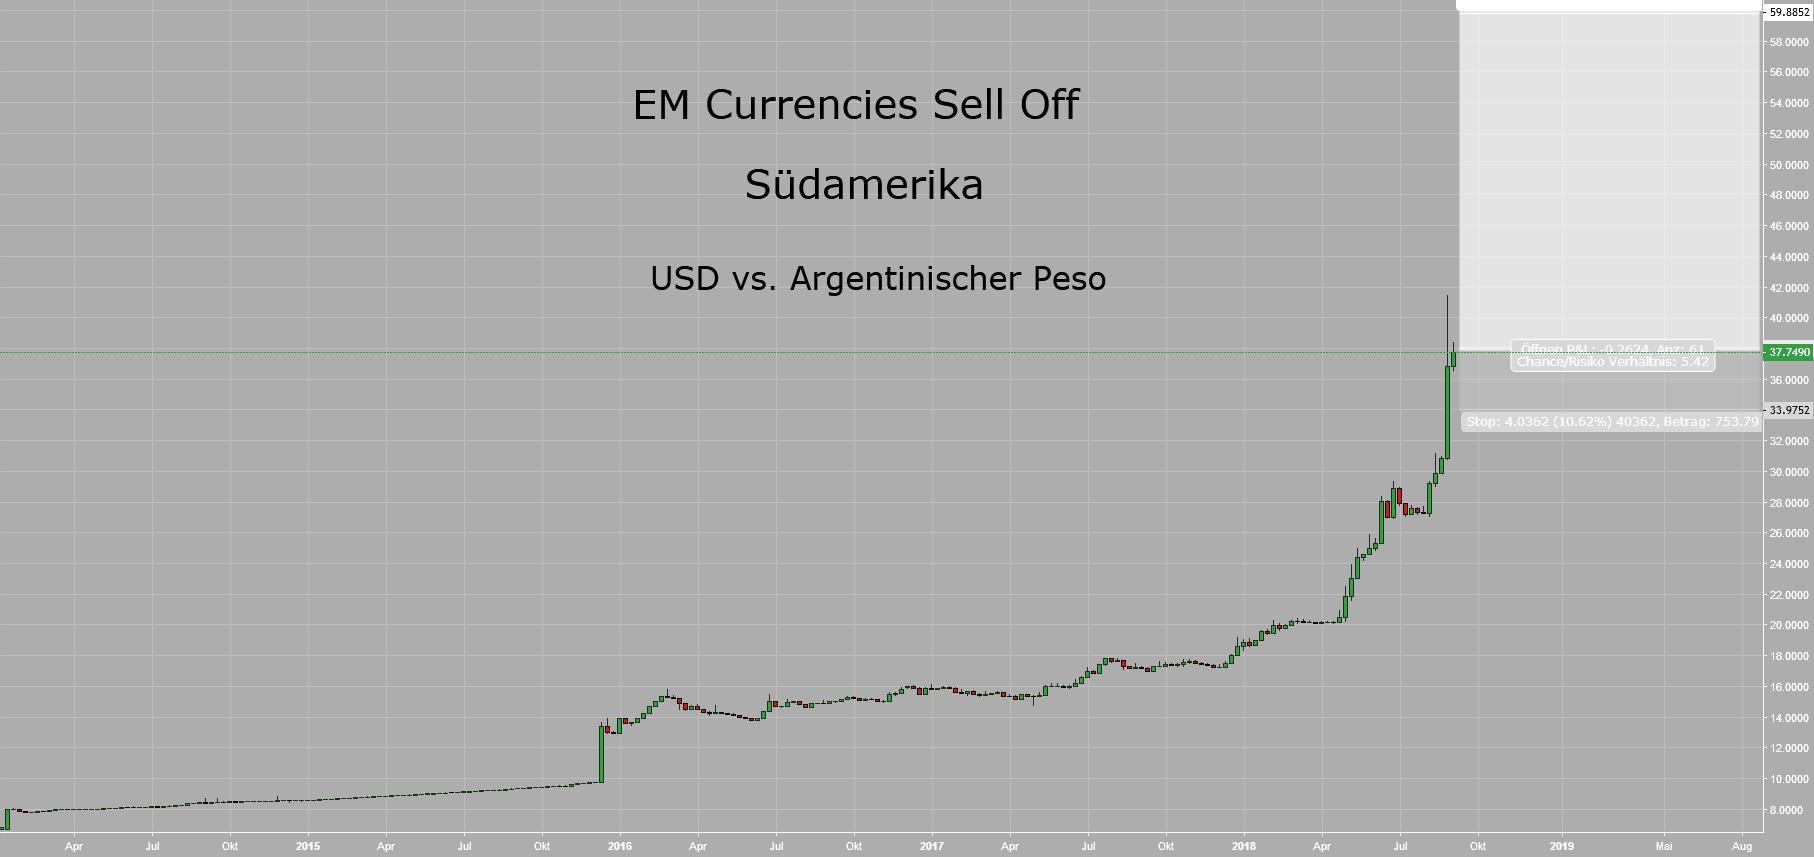 EM Currencies Sell Off II - Südamerika I: Argentinischer Peso